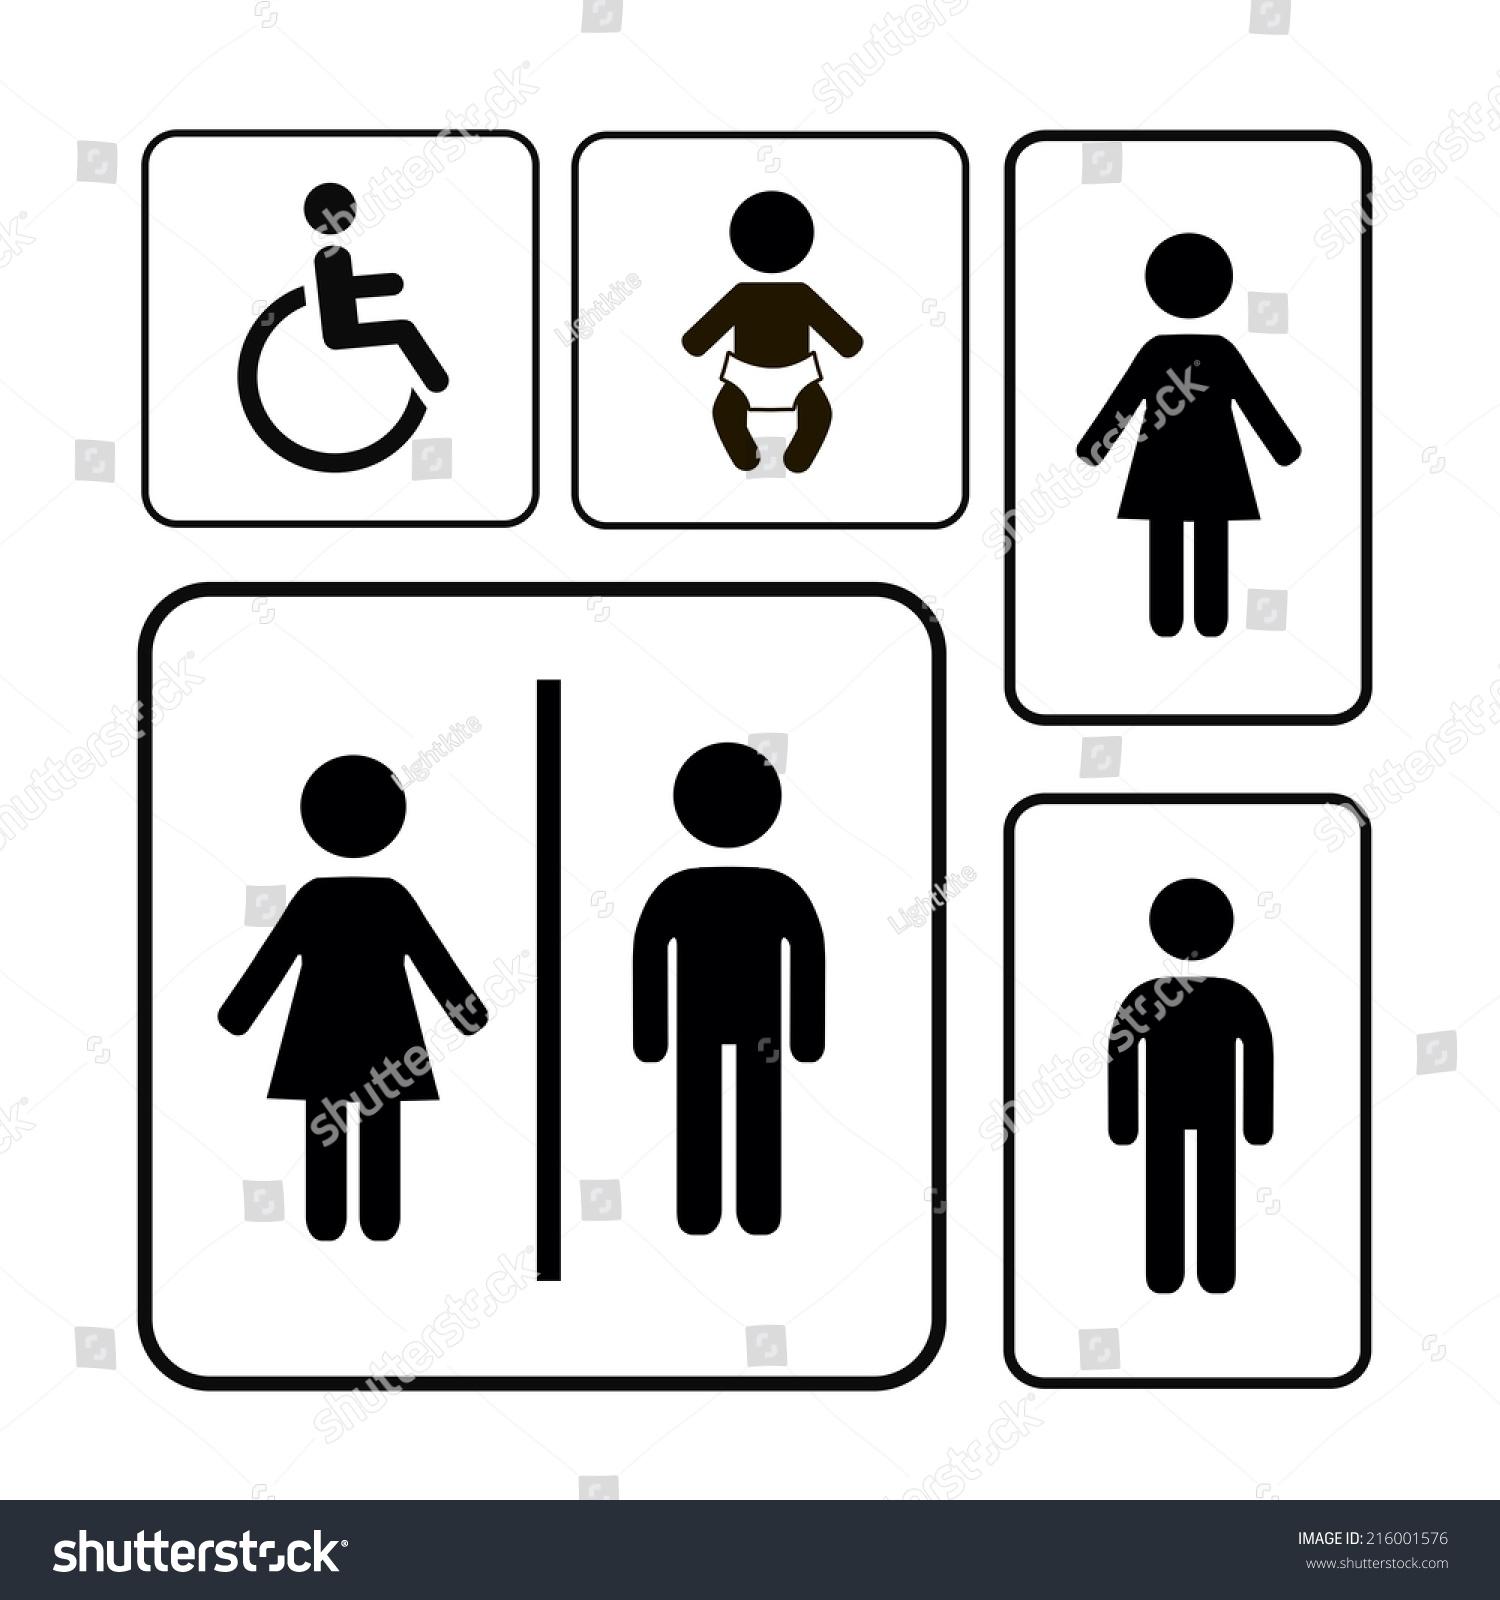 Bathroom Sign Vector restroom sign vector black silhouettes on stock vector 216001576